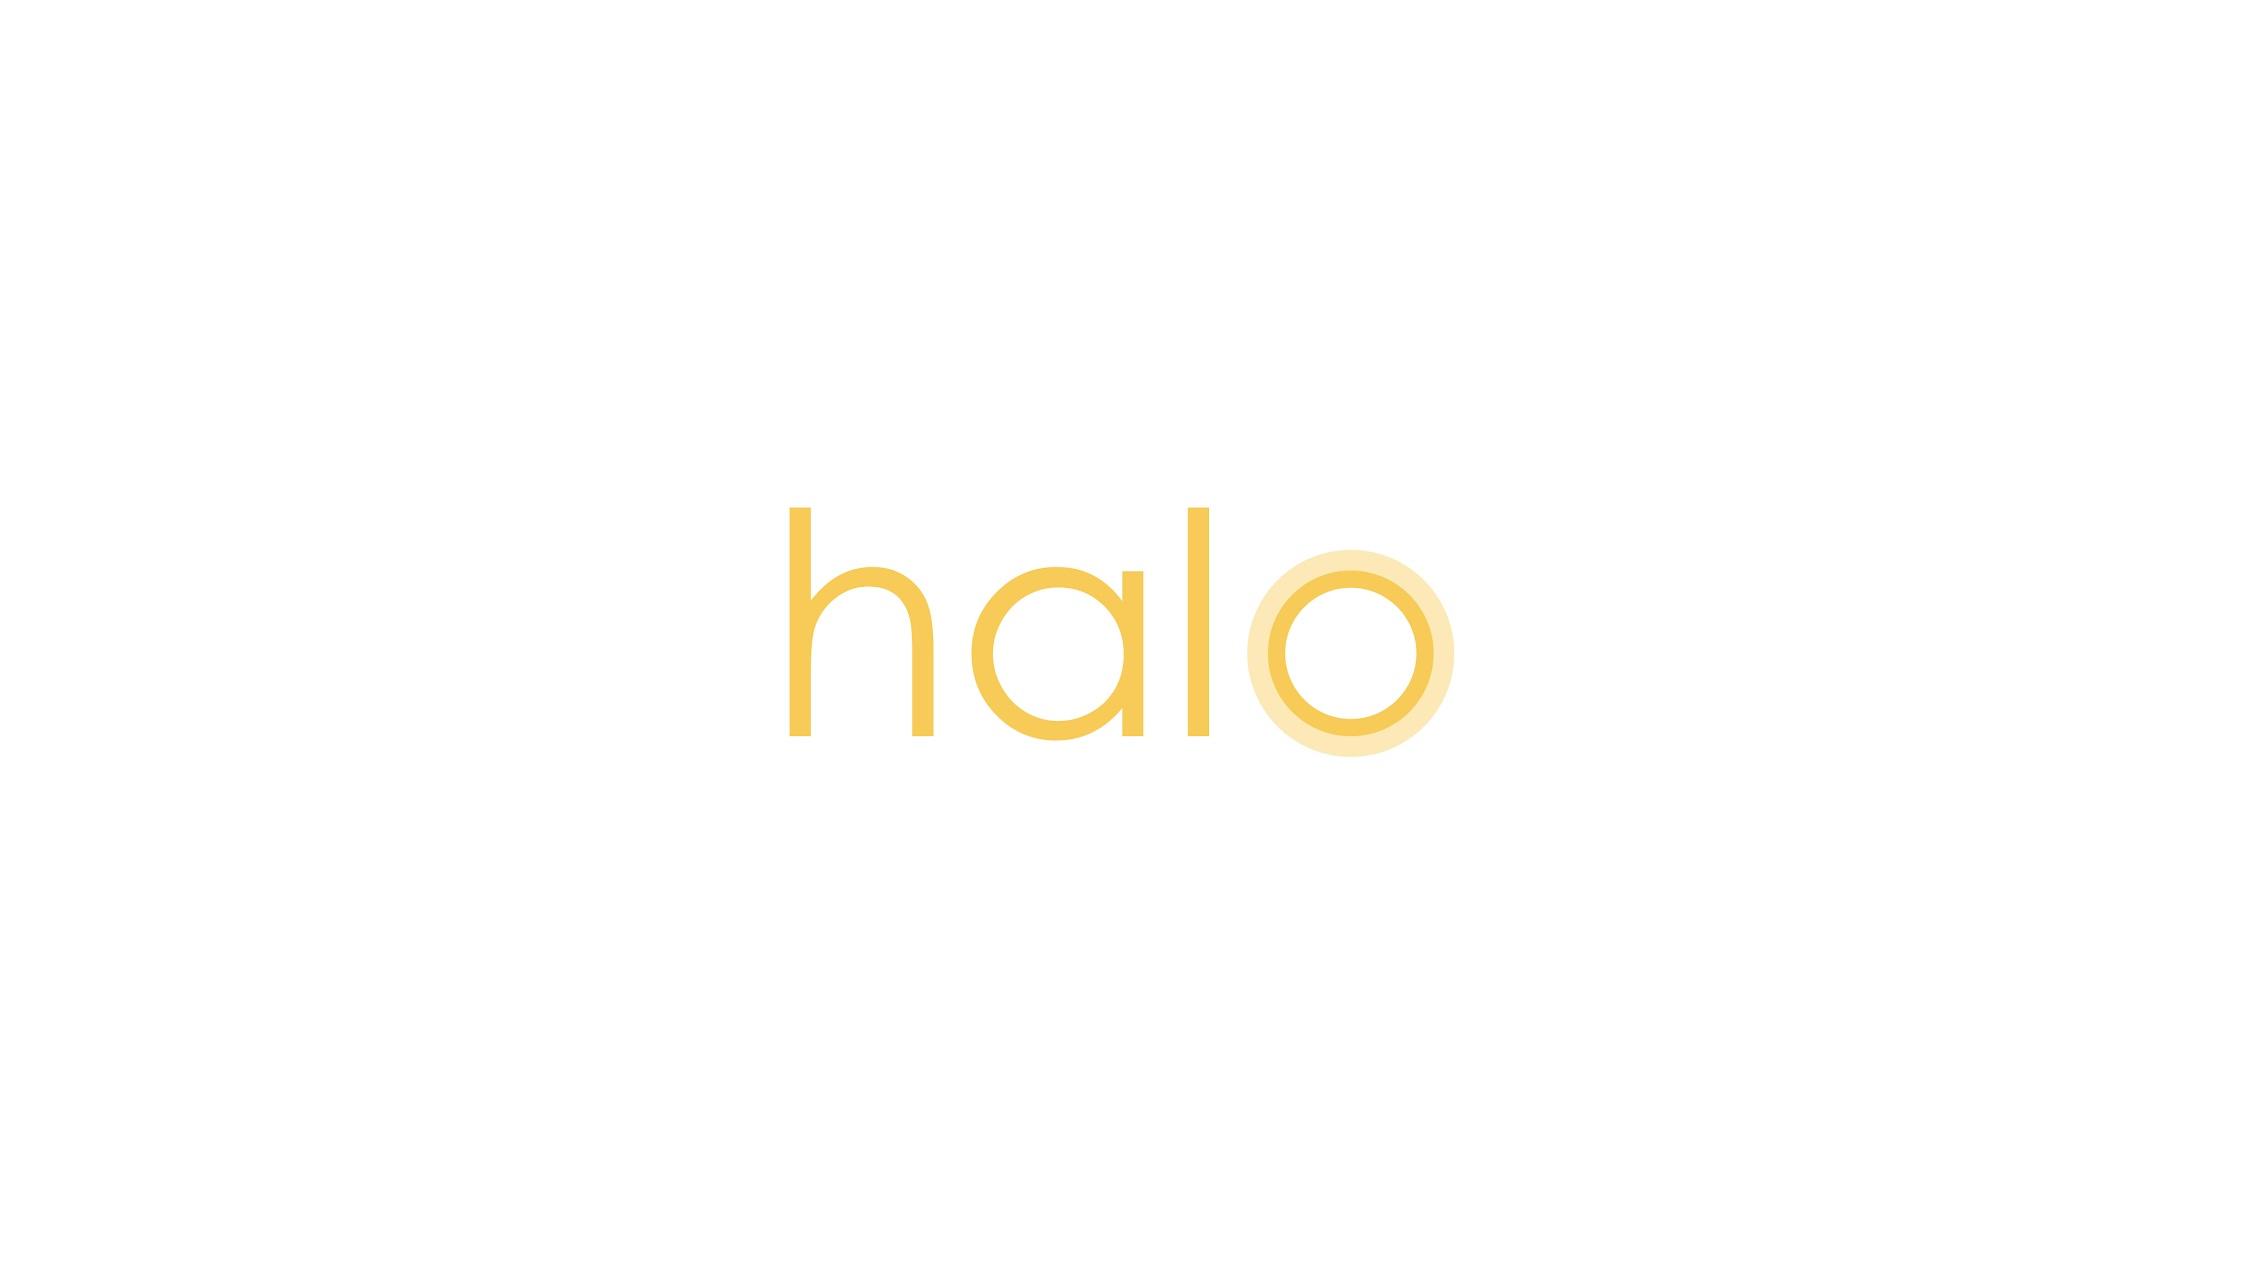 Halo Inc.